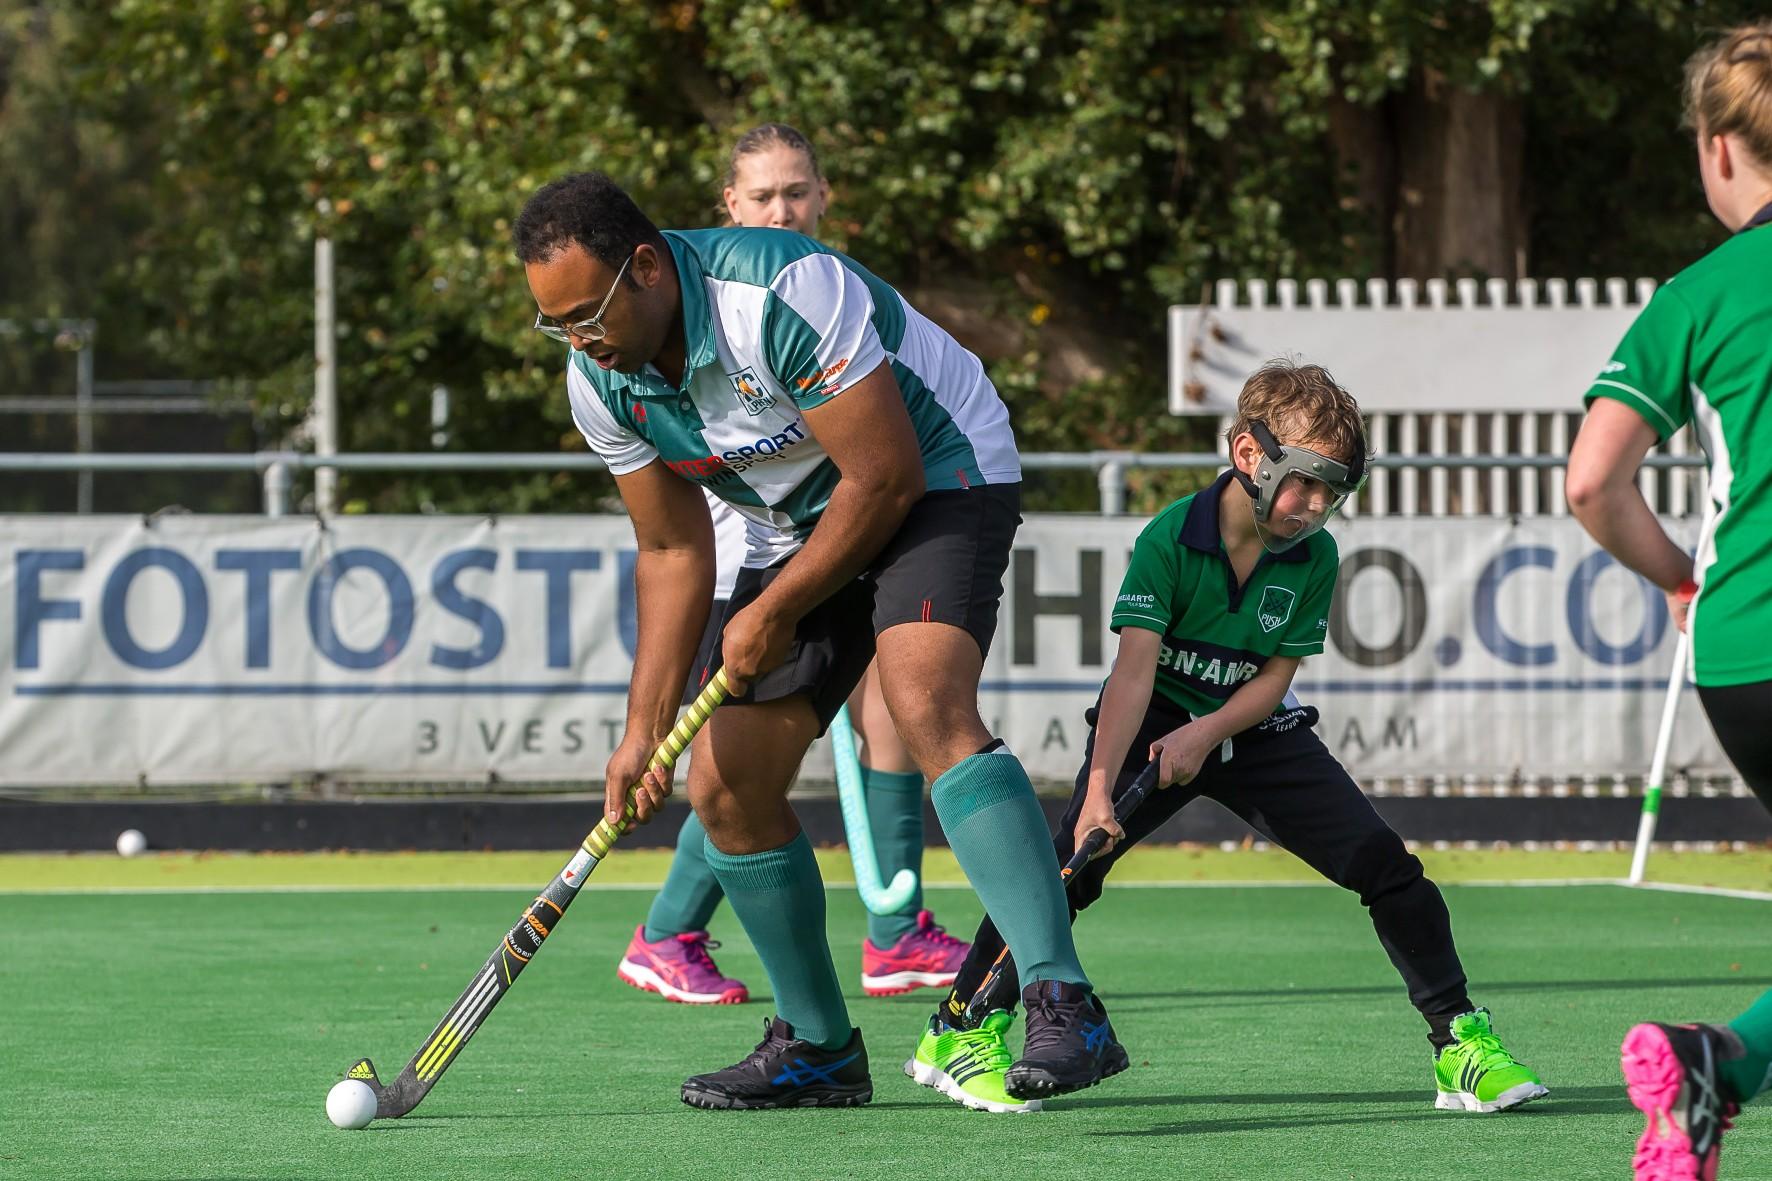 G-Hockey en korfbaltoernooi van Fonds Gehandicaptensport en Simpel in foto's: